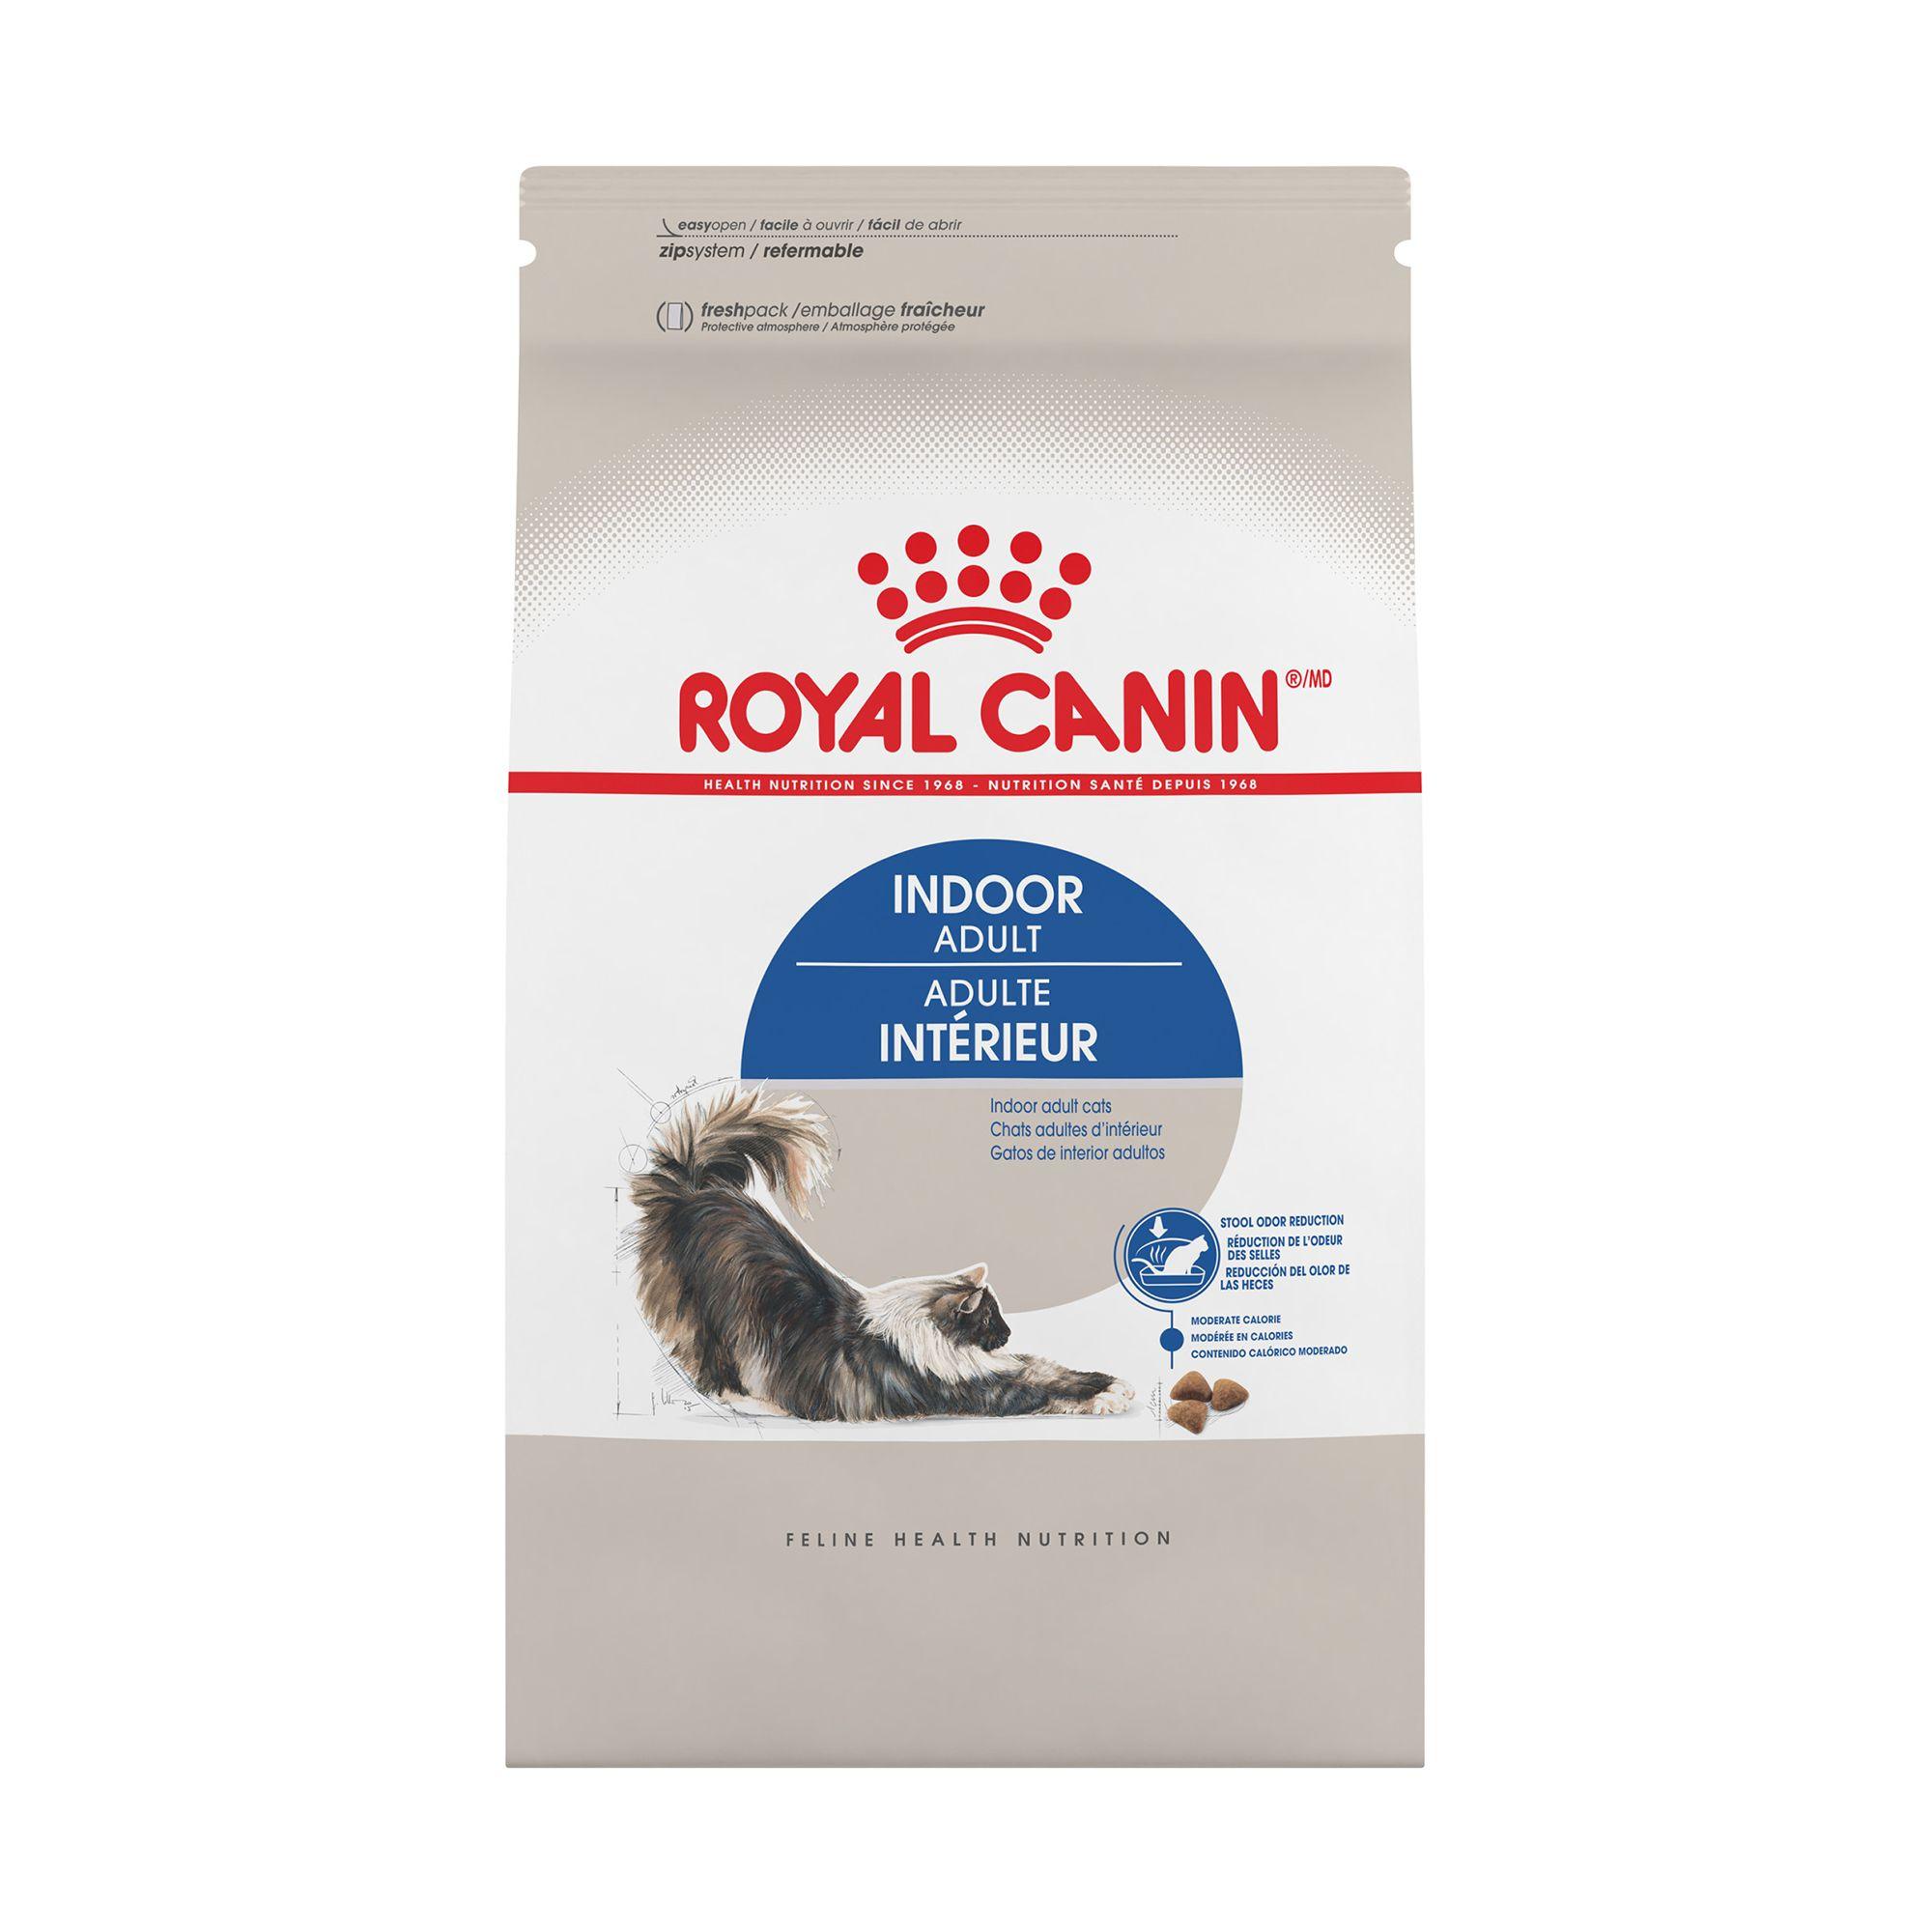 royal canin cat food usa. Black Bedroom Furniture Sets. Home Design Ideas